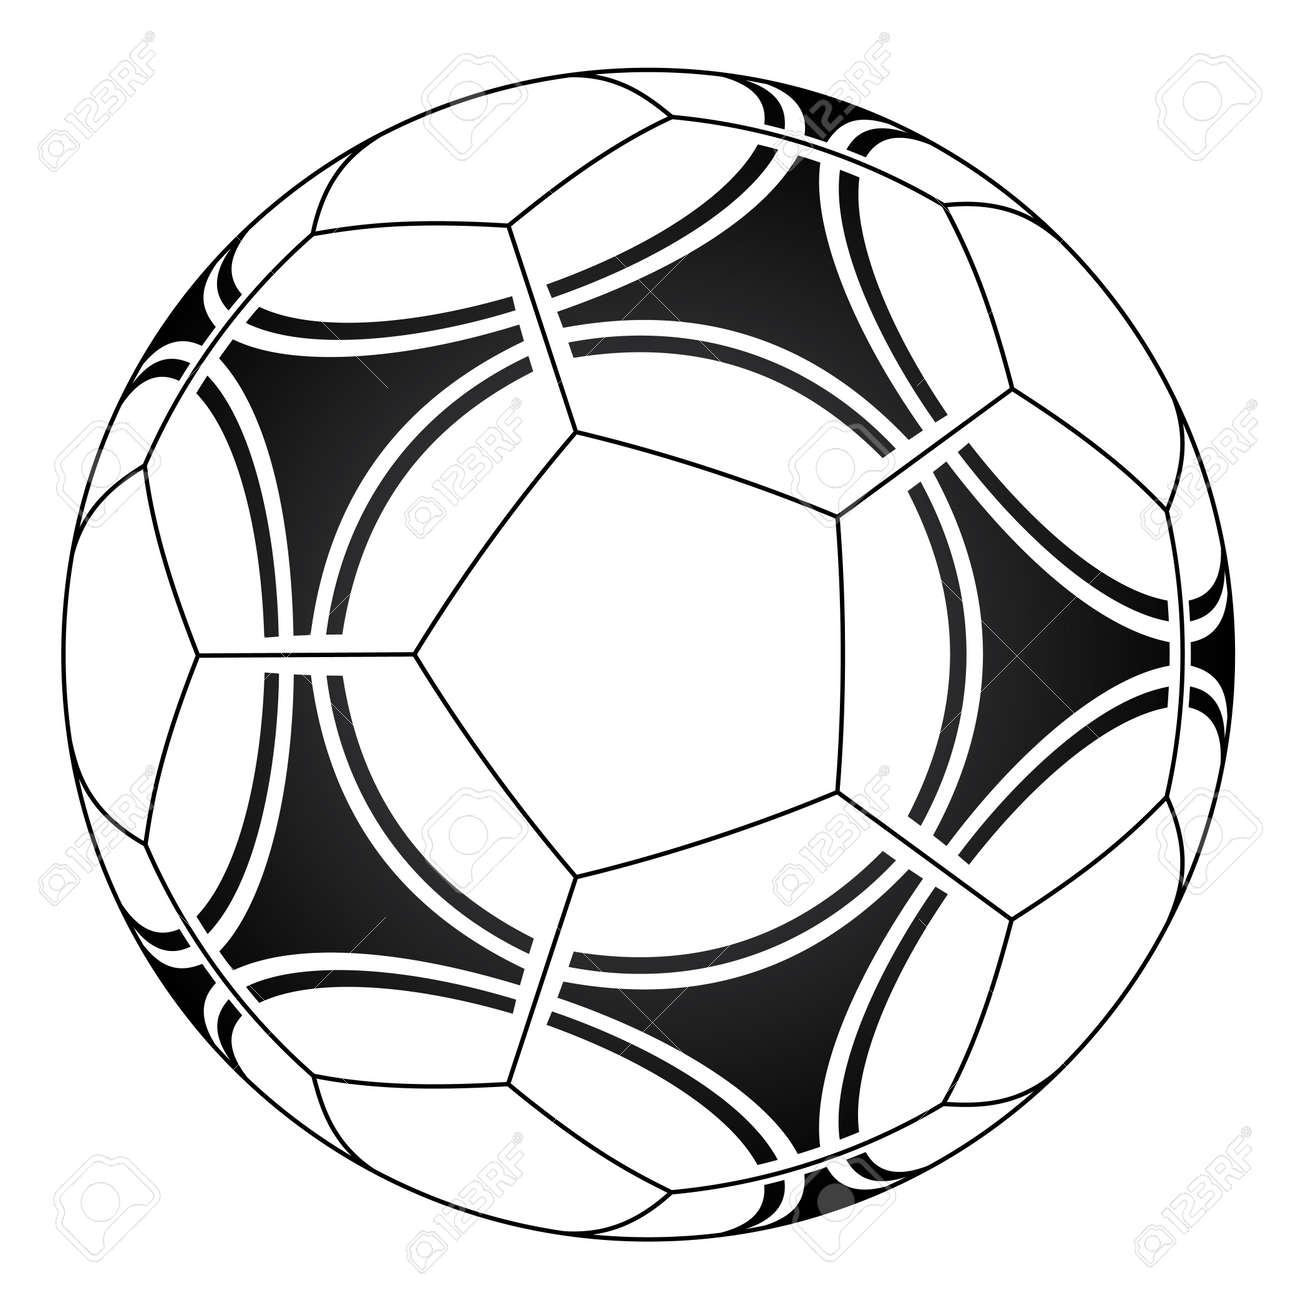 vector soccer ball royalty free cliparts vectors and stock rh 123rf com vector grunge soccer ball vector soccer ball icon